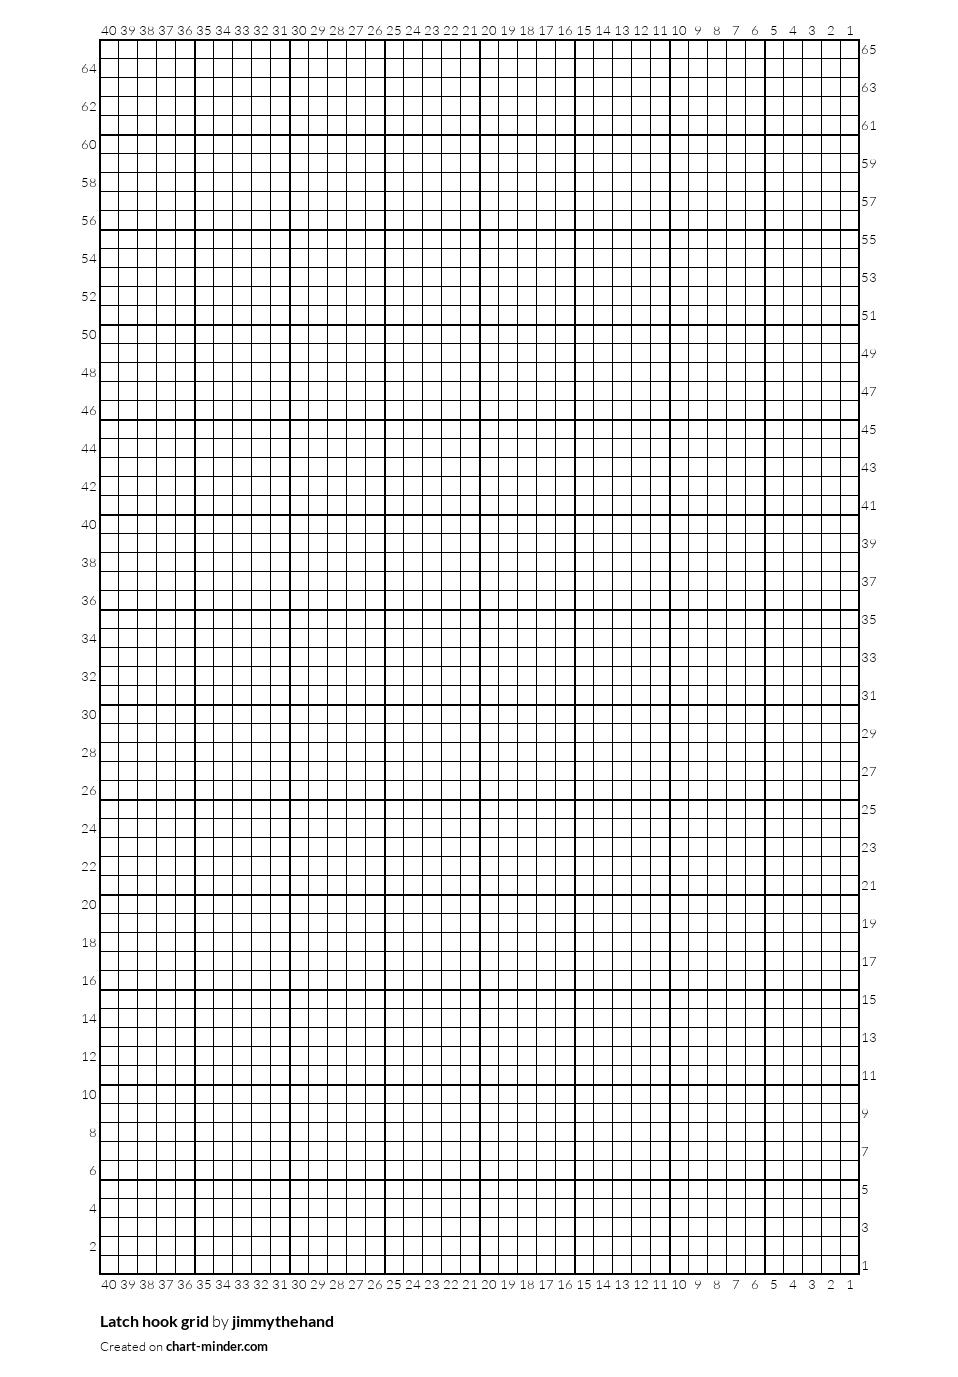 Latch hook grid